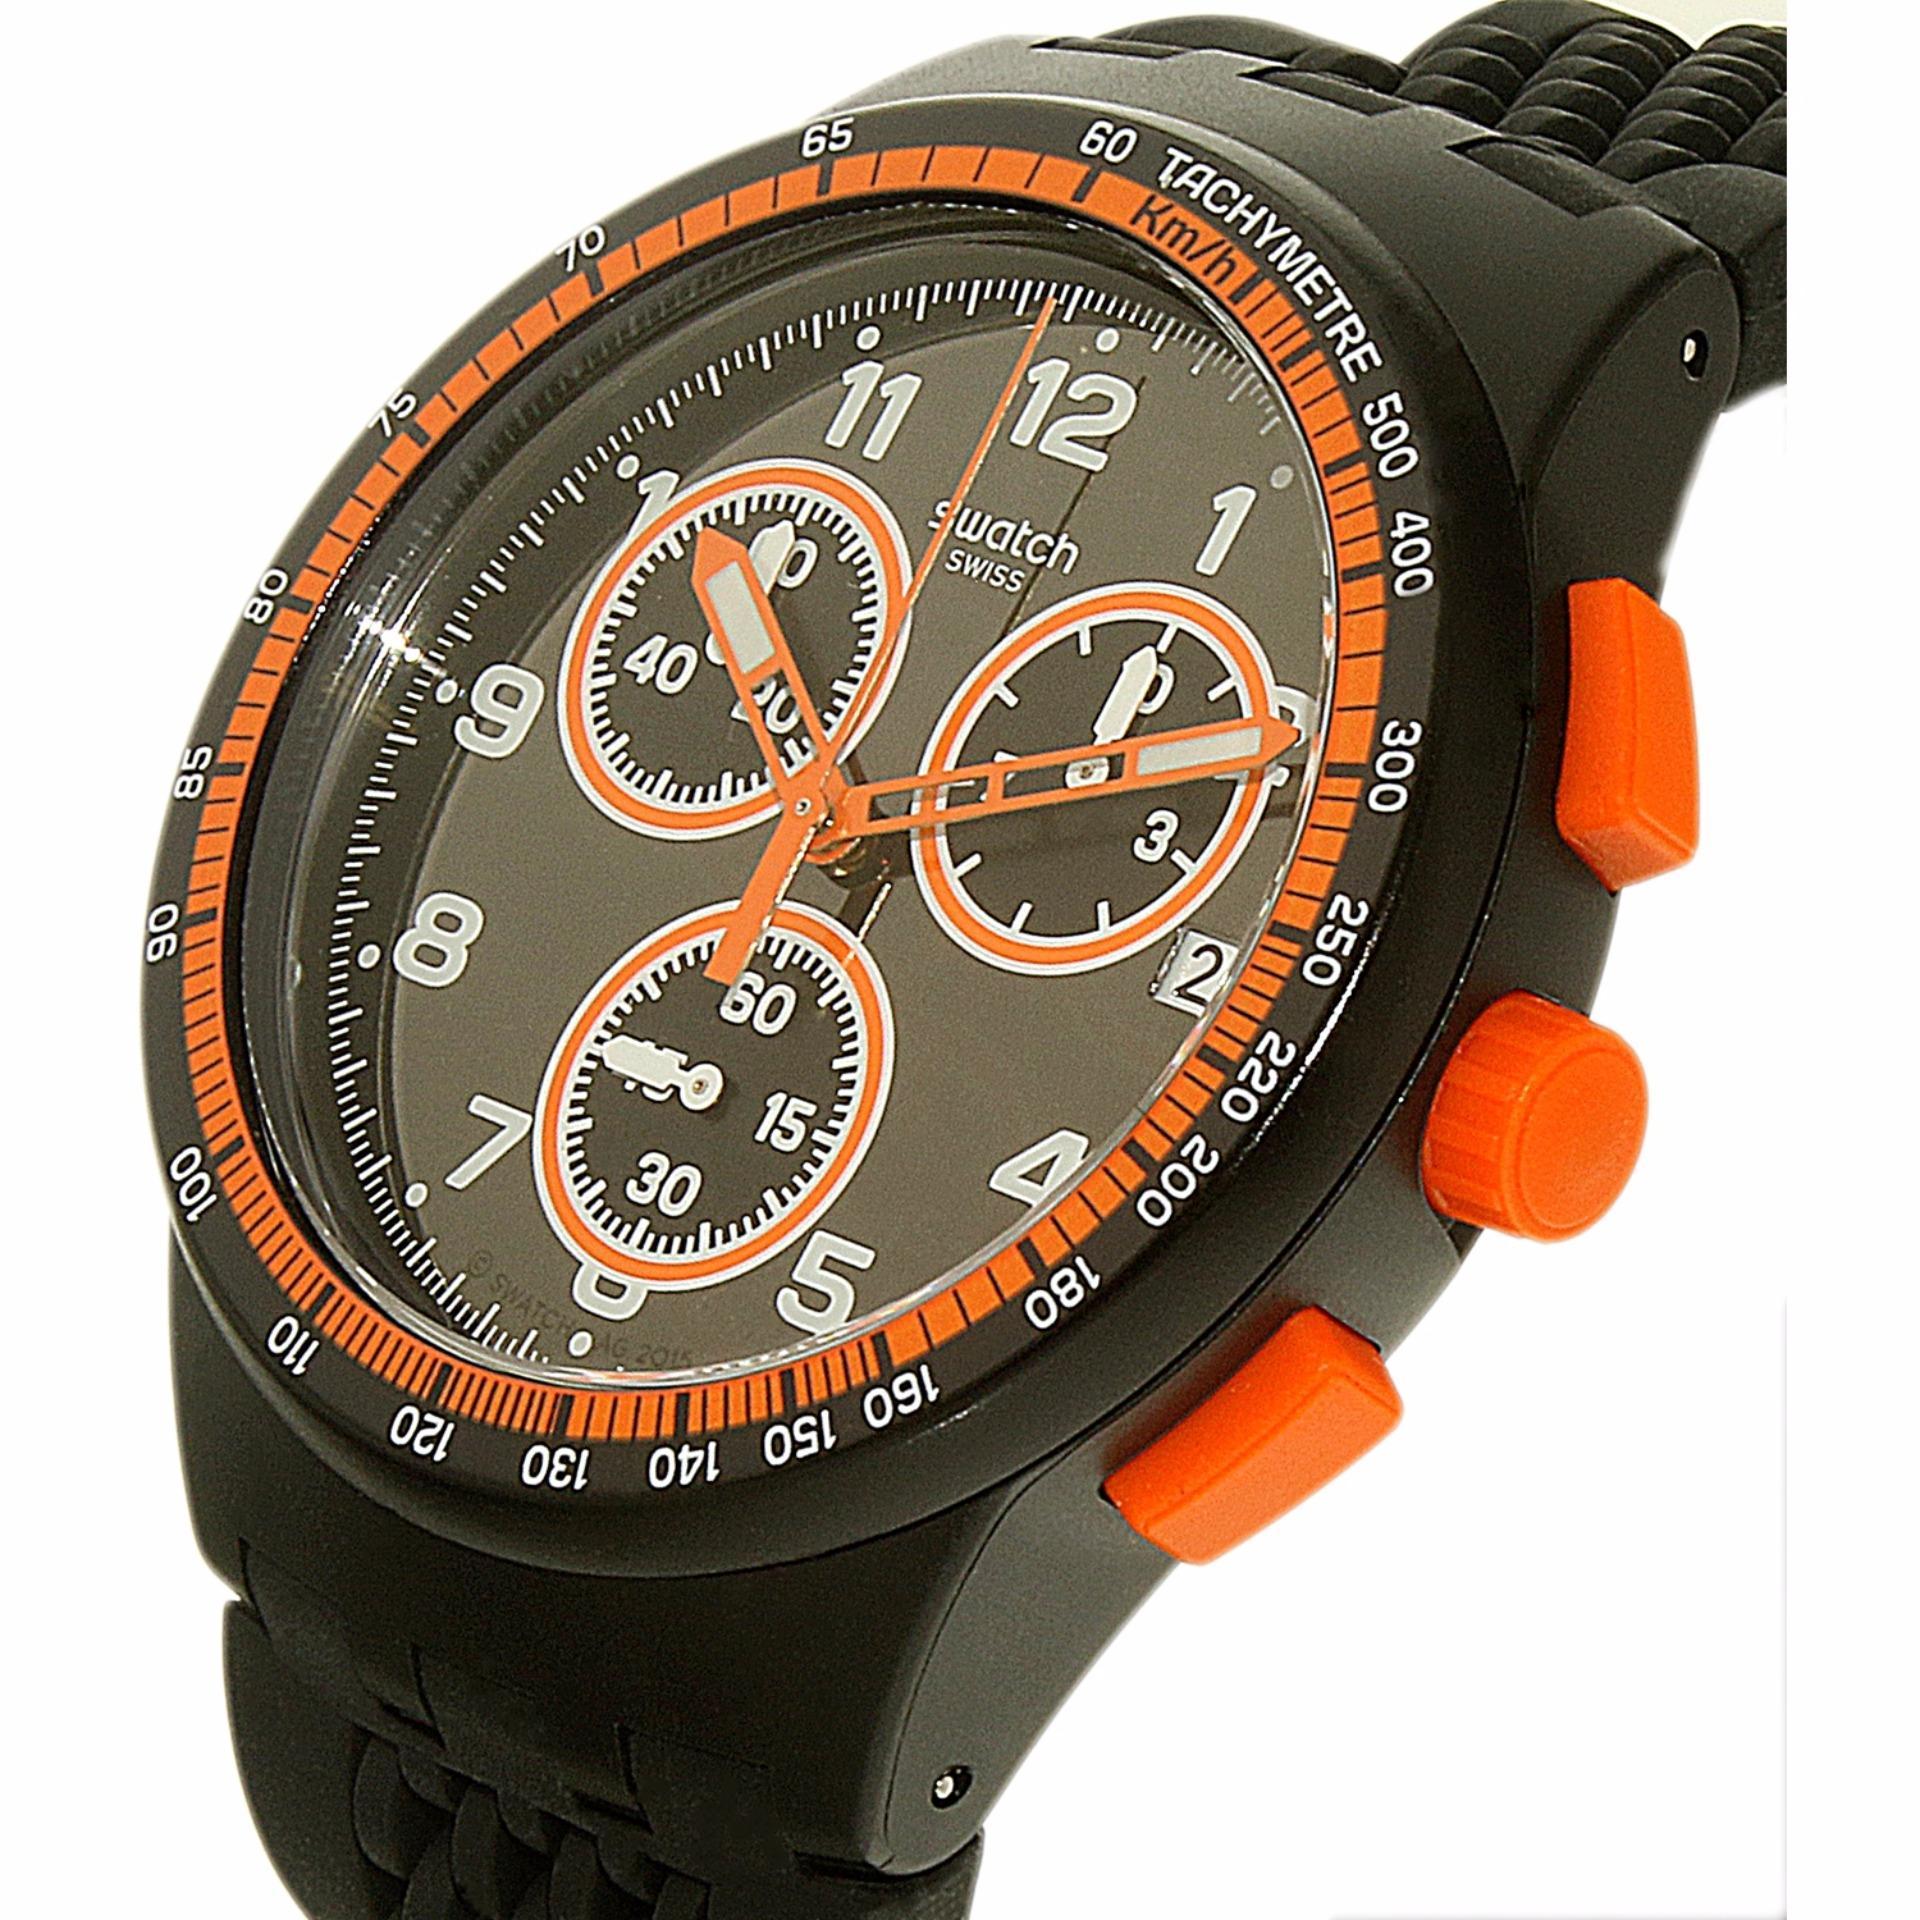 Swatch Jam Tangan Pria Hitam Emas Strap Suob126 Seeing Circles Original 100  Yvs424 Disorderly Chrono Susb408 Nerolino Bahan Tali Silikon